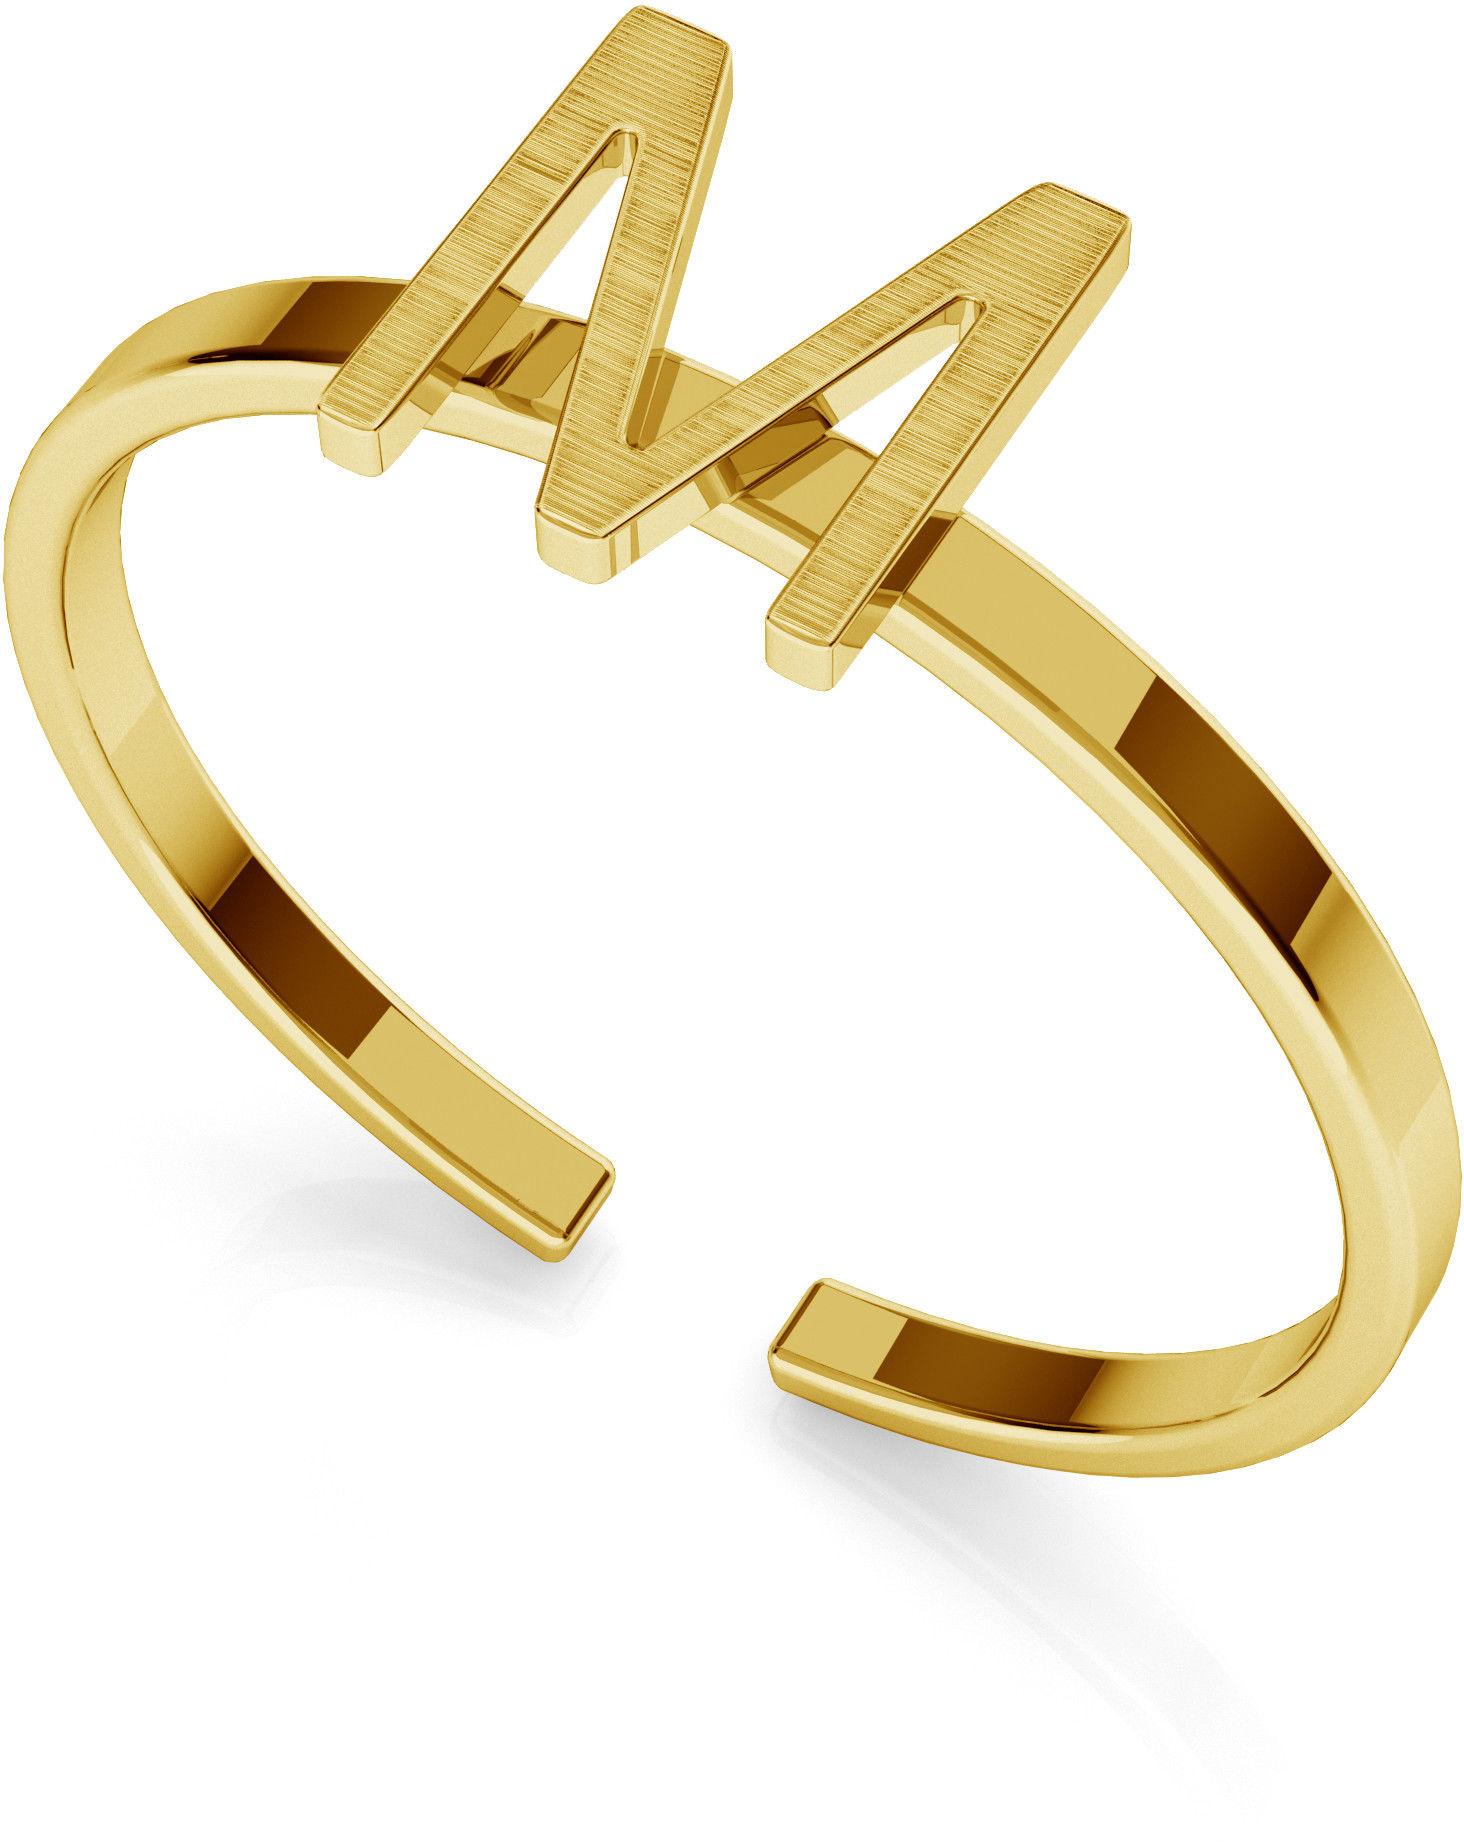 Srebrny pierścionek z literką My RING, srebro 925 : Litera - P, Srebro - kolor pokrycia - Pokrycie platyną